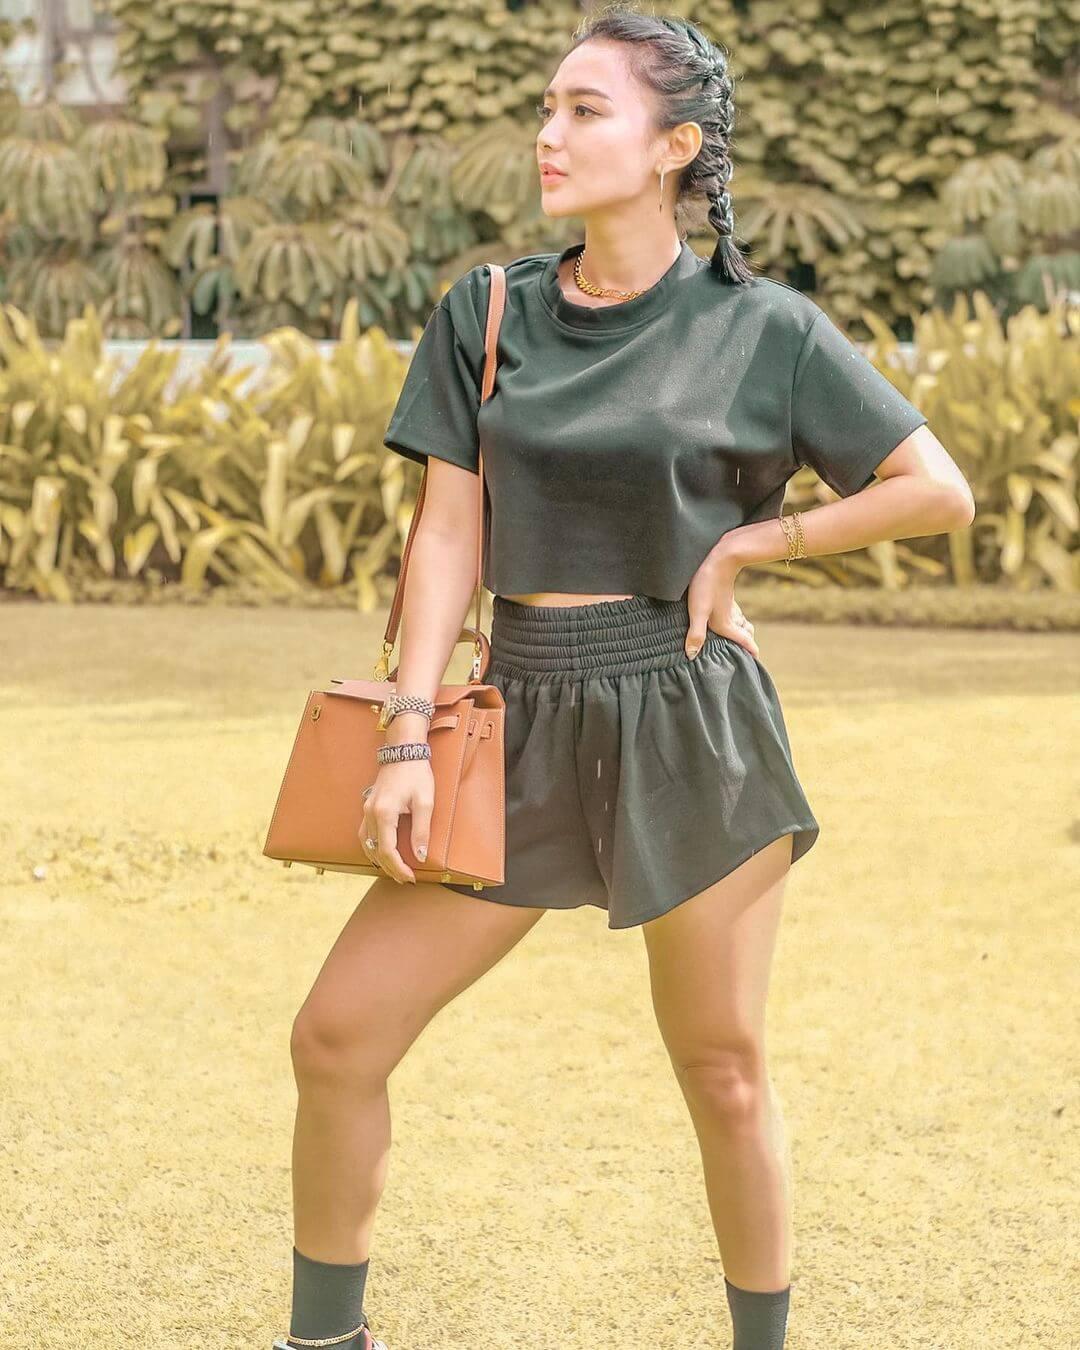 Hottest Indonesian Model Wika Salim Jpg